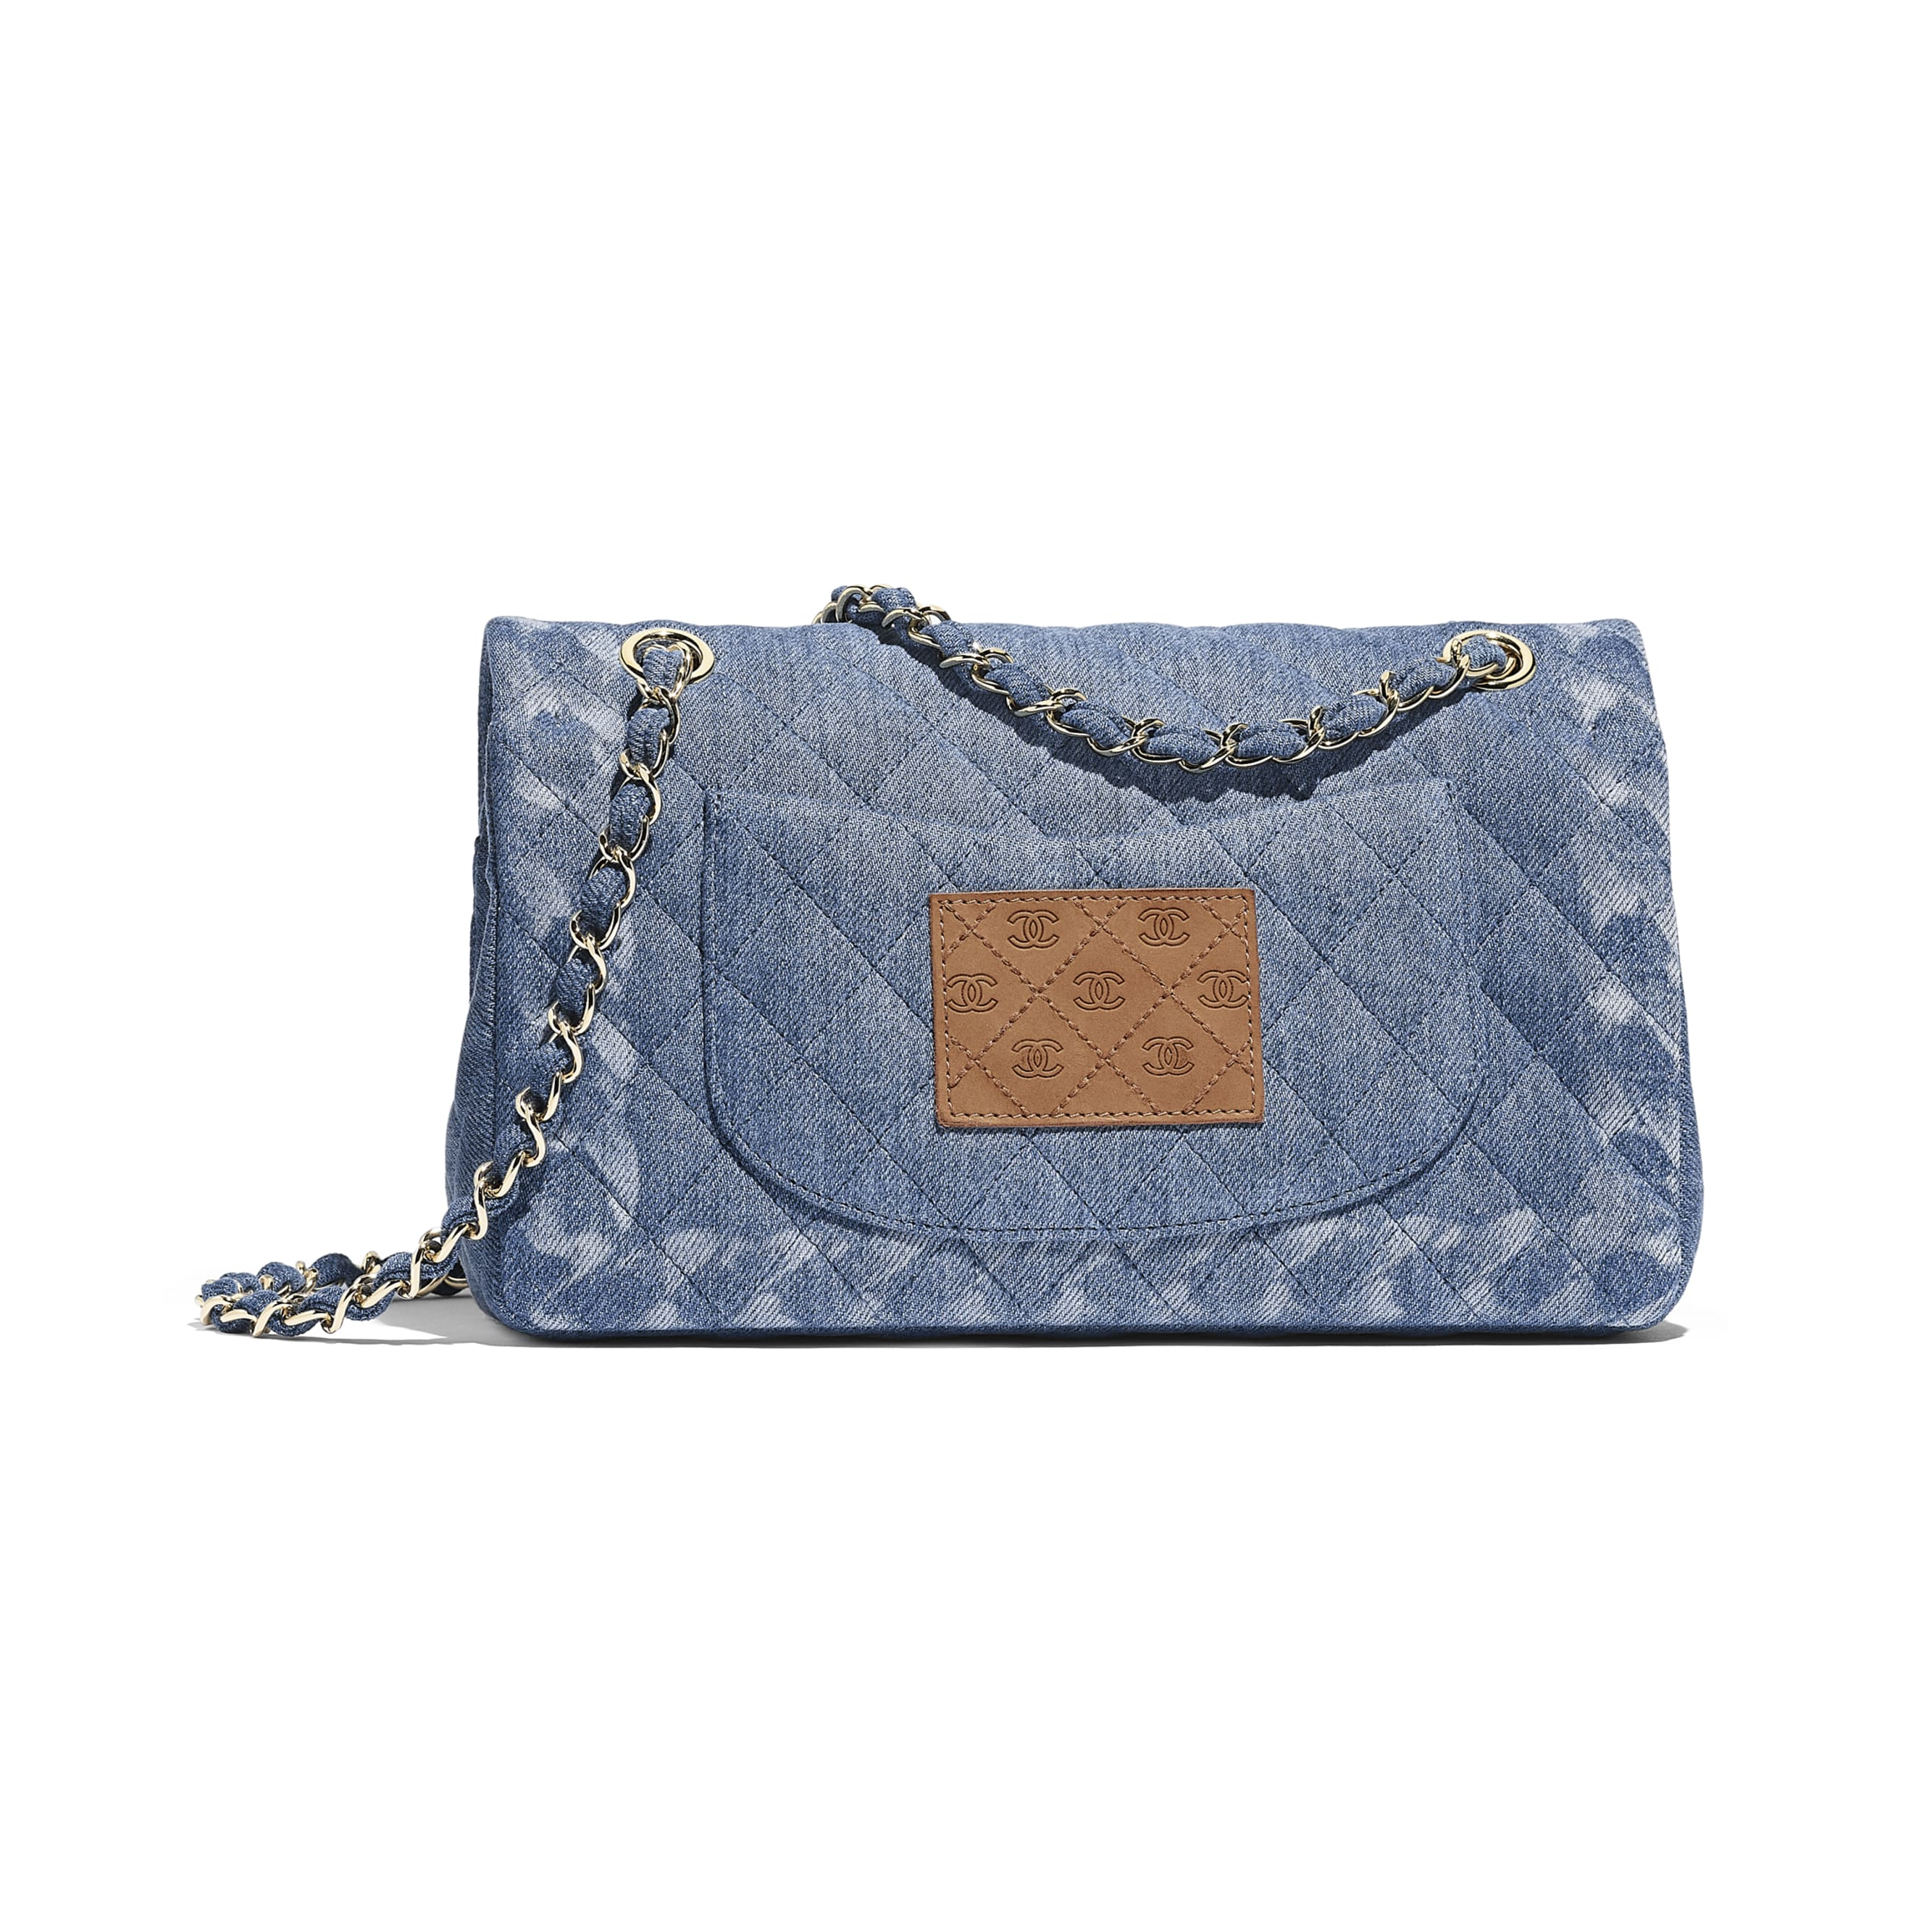 d968689b837b ... Classic Handbag - Blue - Denim   Gold-Tone Metal - Alternative view -  see